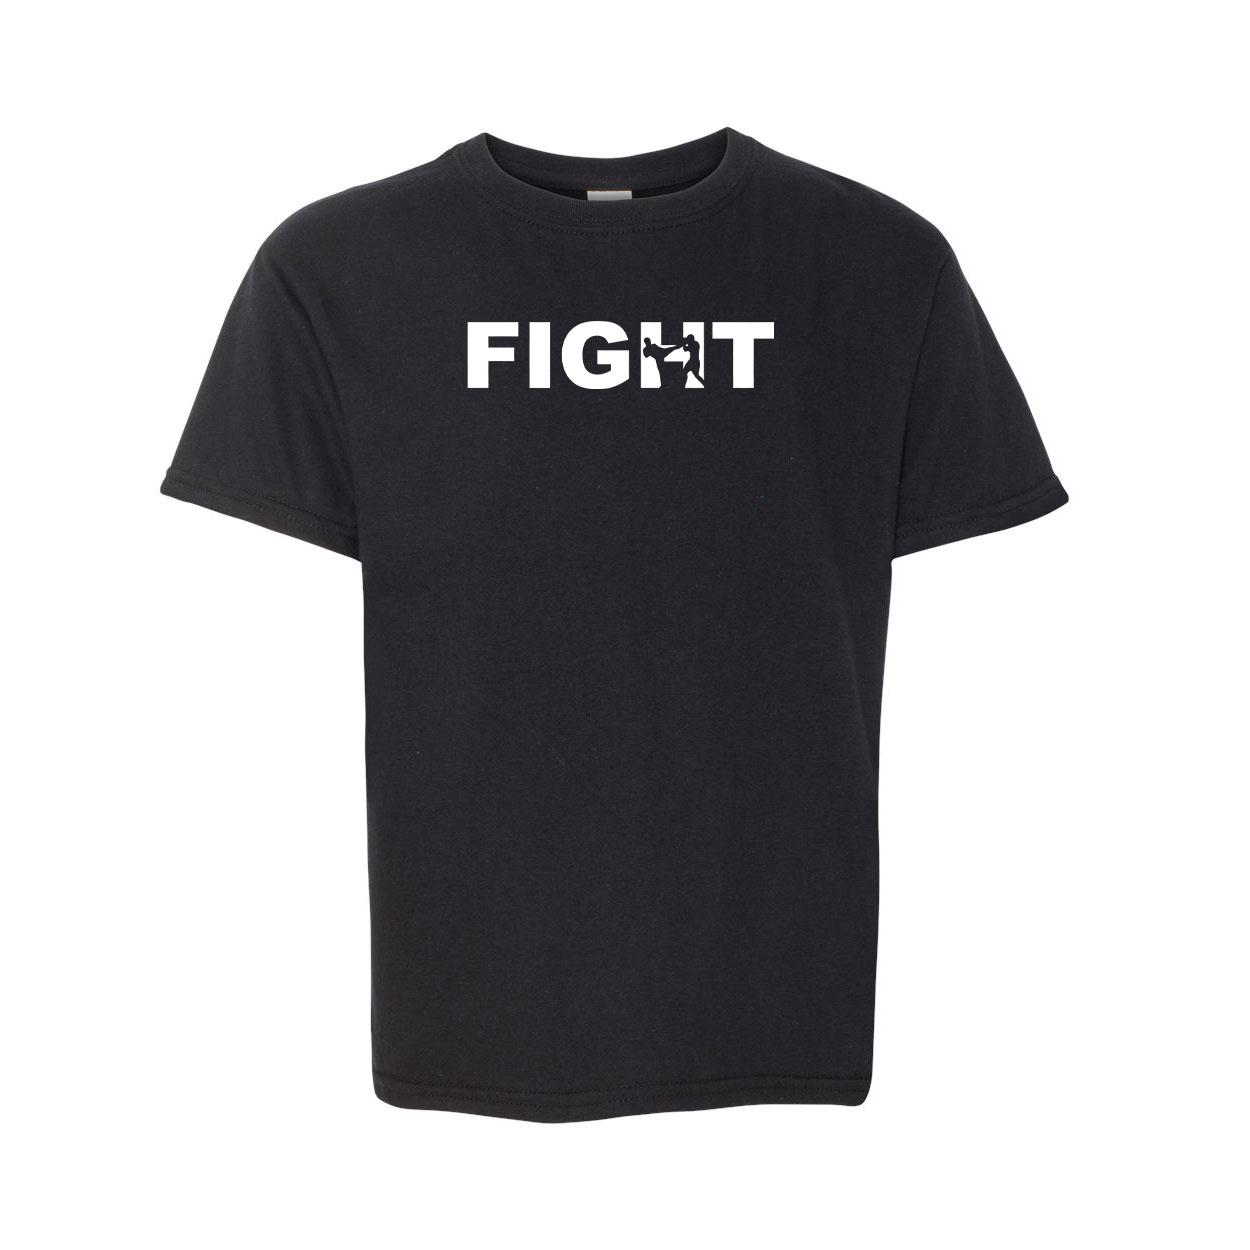 Fight Kick Logo Classic Youth T-Shirt Black (White Logo)